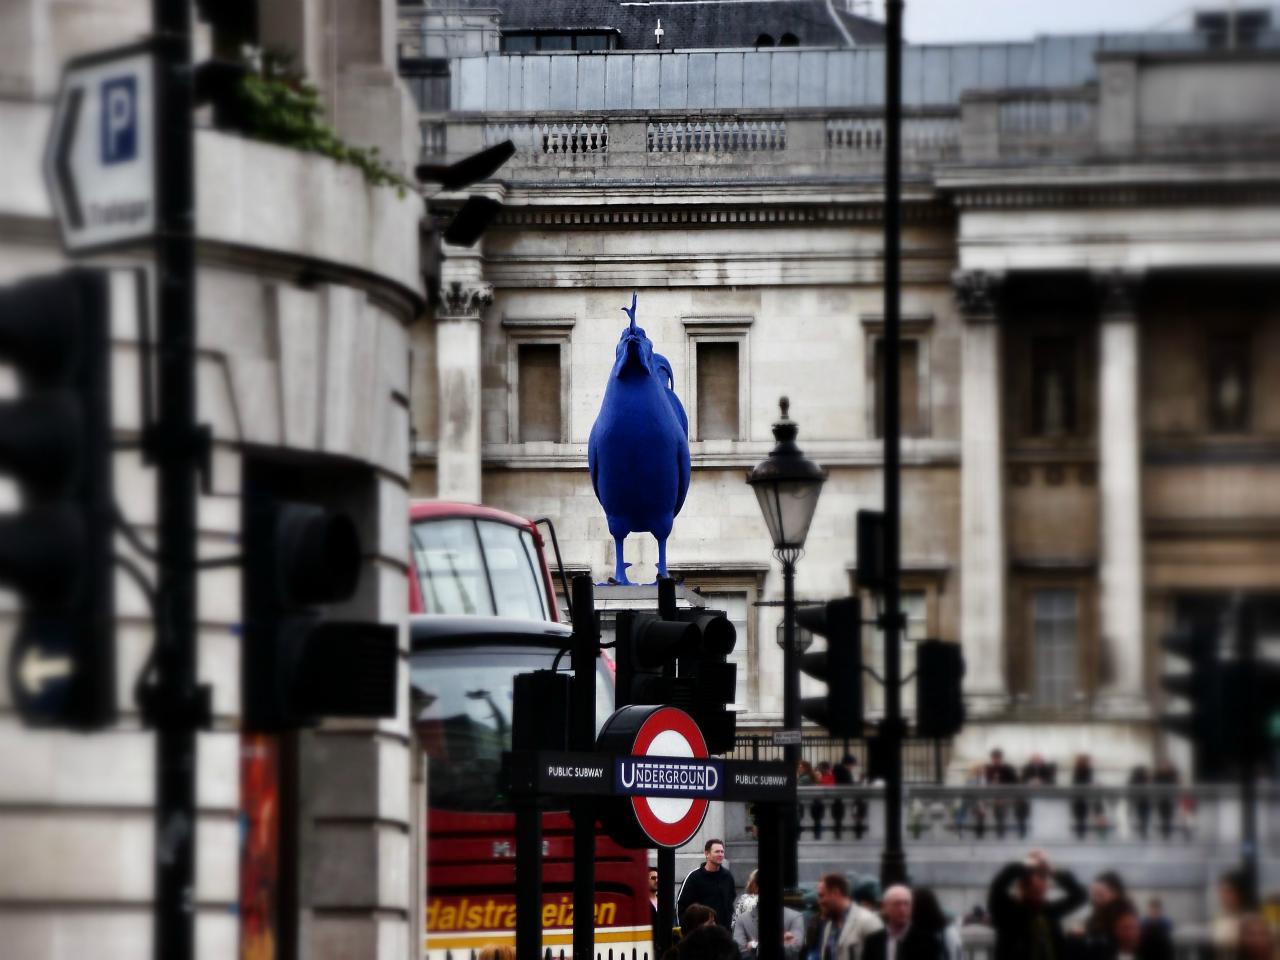 Hahn/Cock, the Fourth Plinth, Trafalgar Square, London, photographed on 12 April 2014